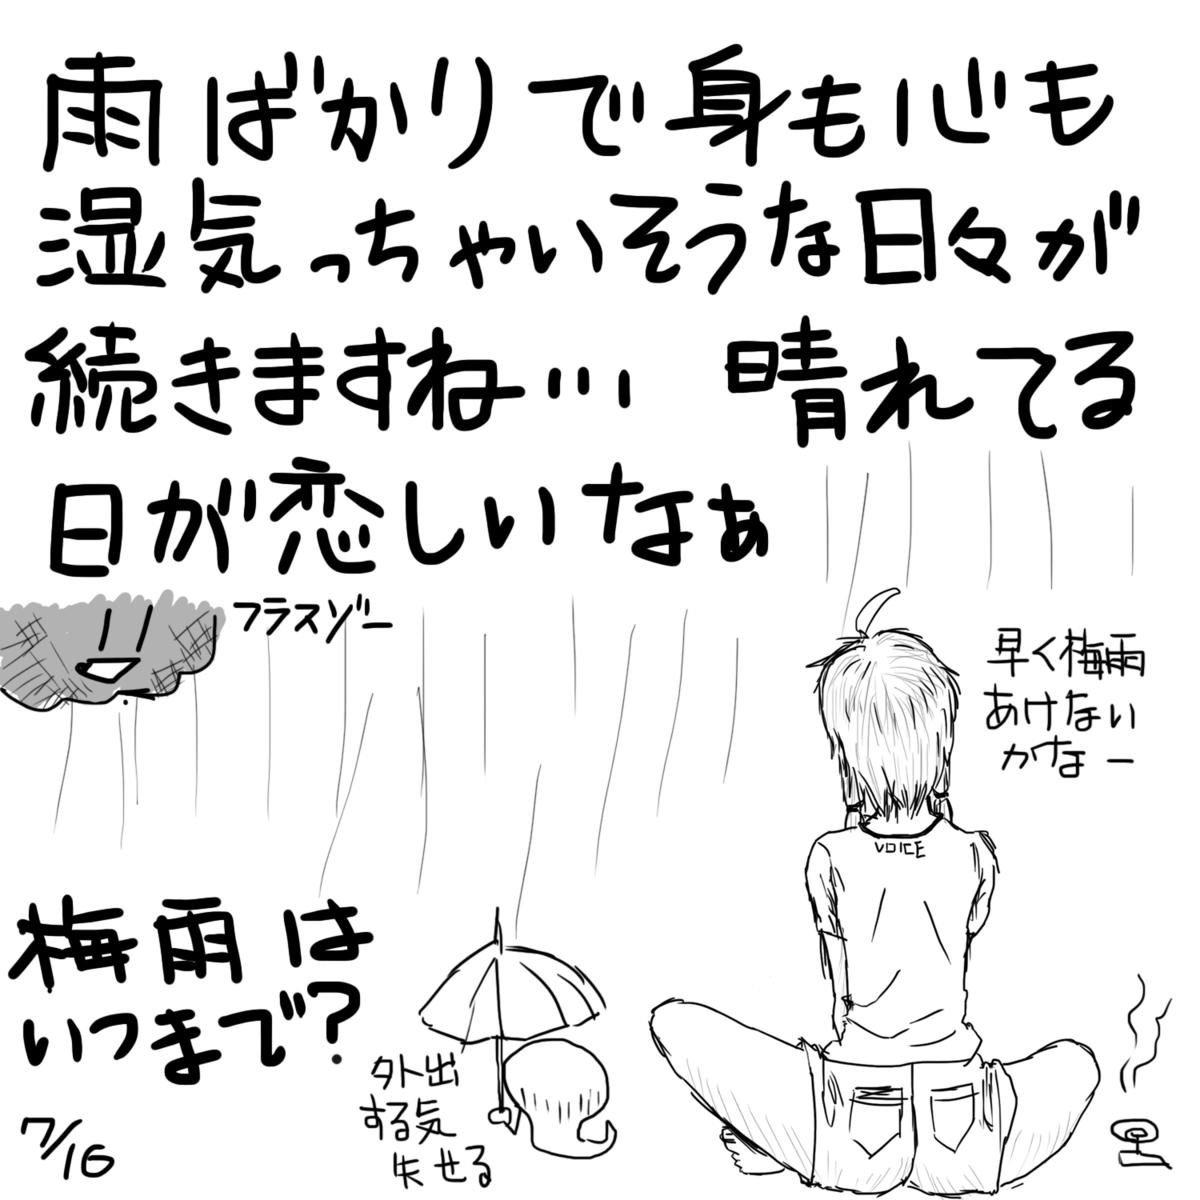 f:id:zomuzomu:20200716115157p:plain